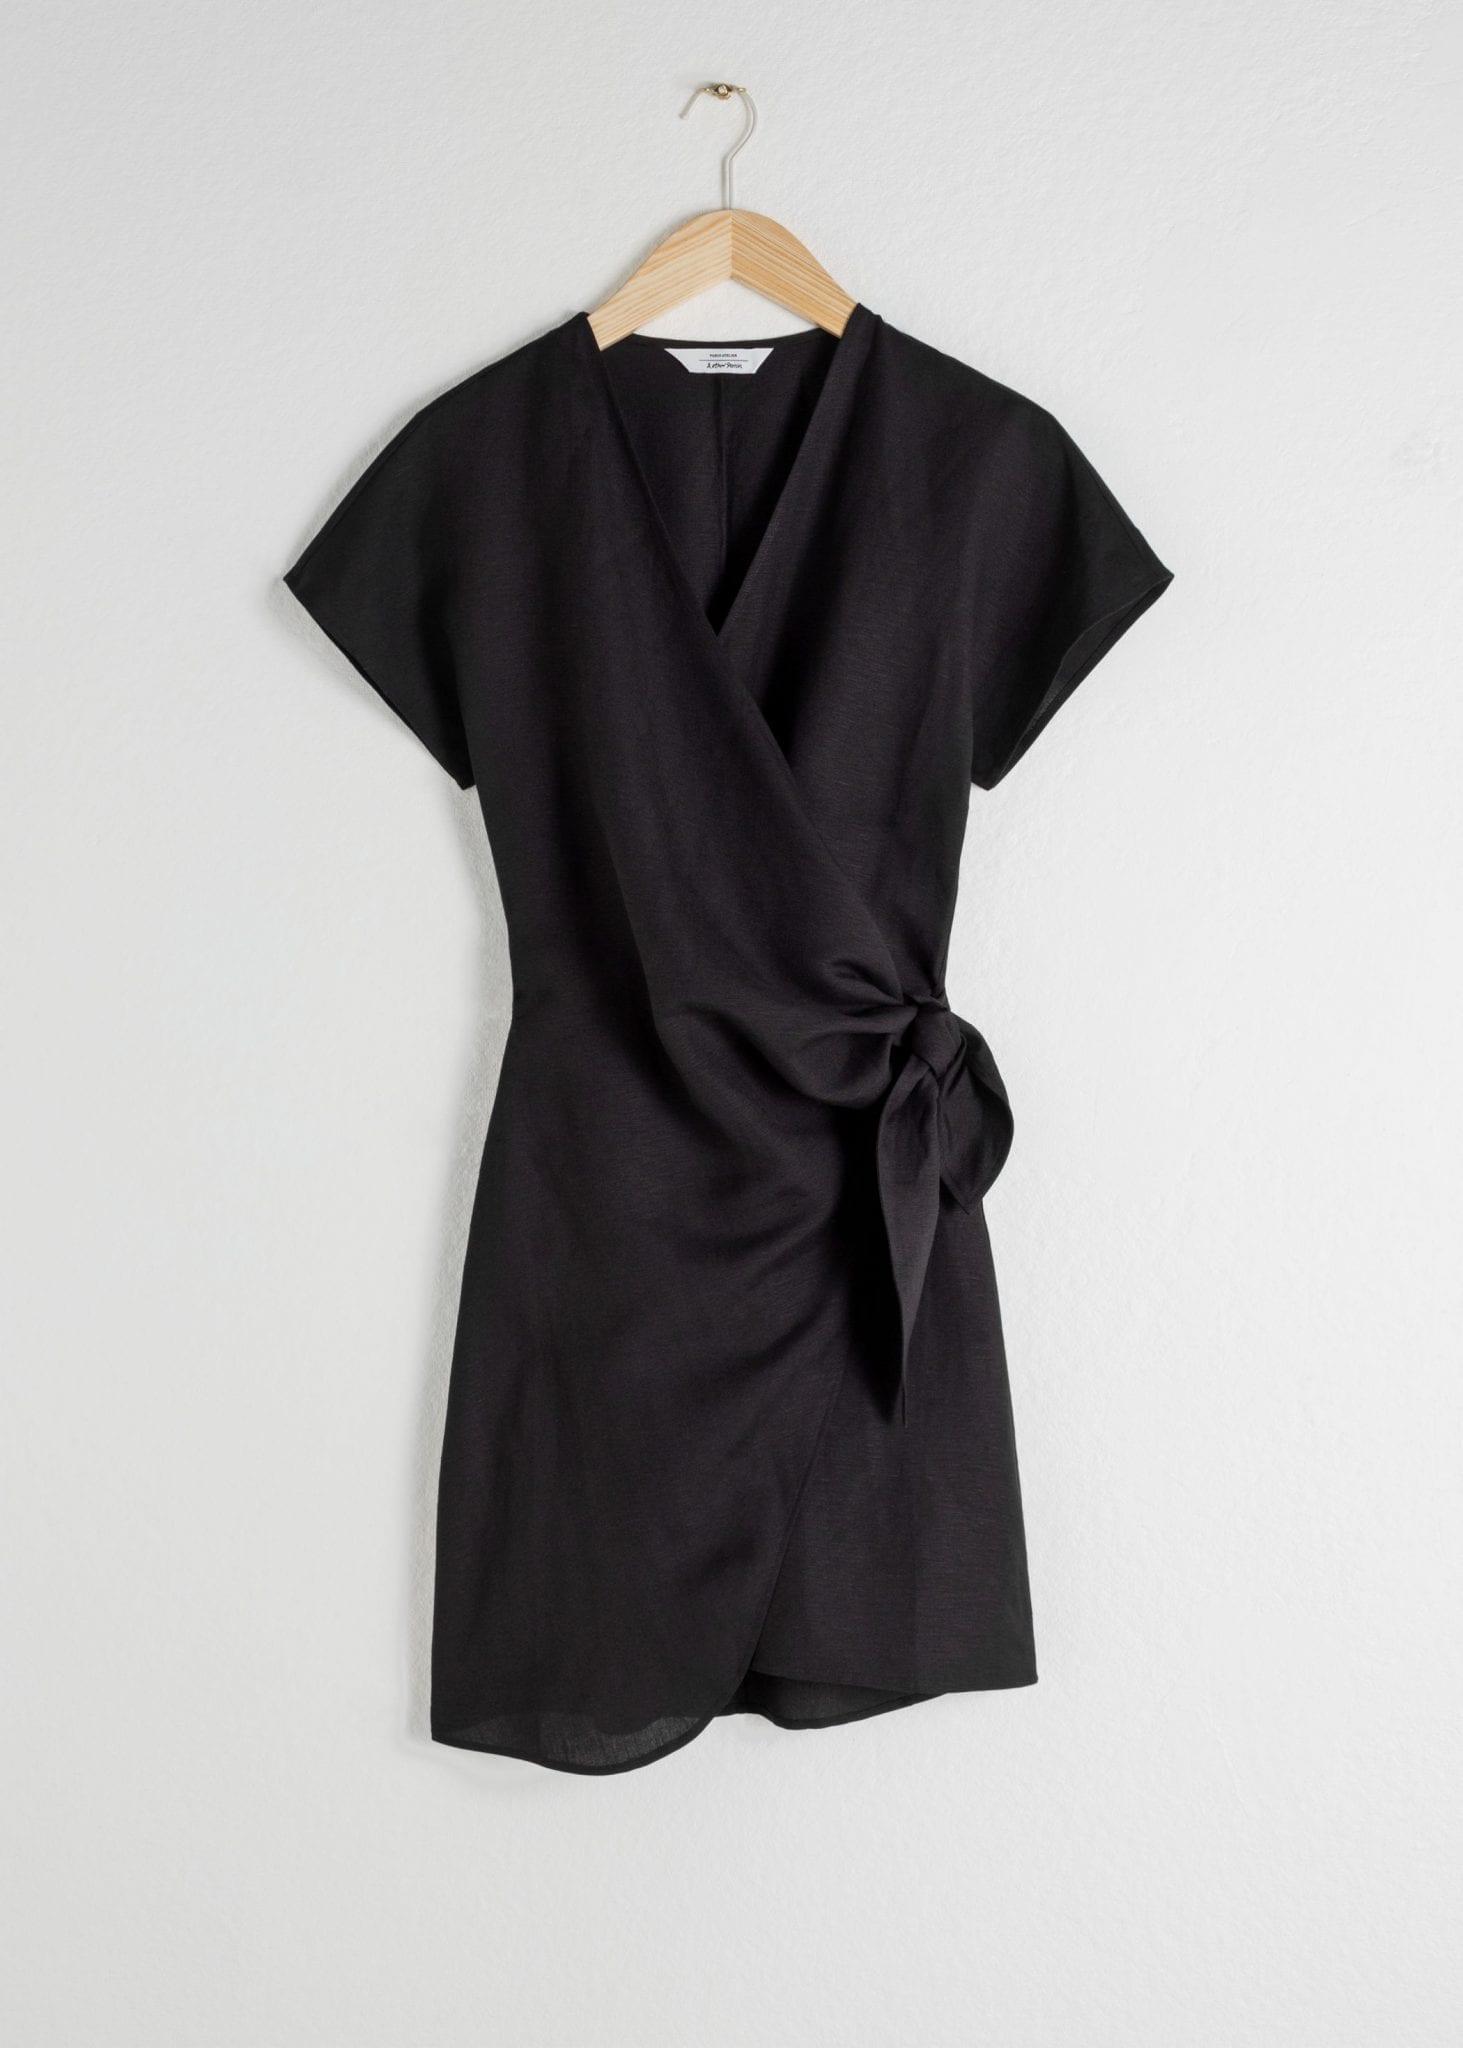 OTHER STORIES Linen Blend Wrap Mini Dress